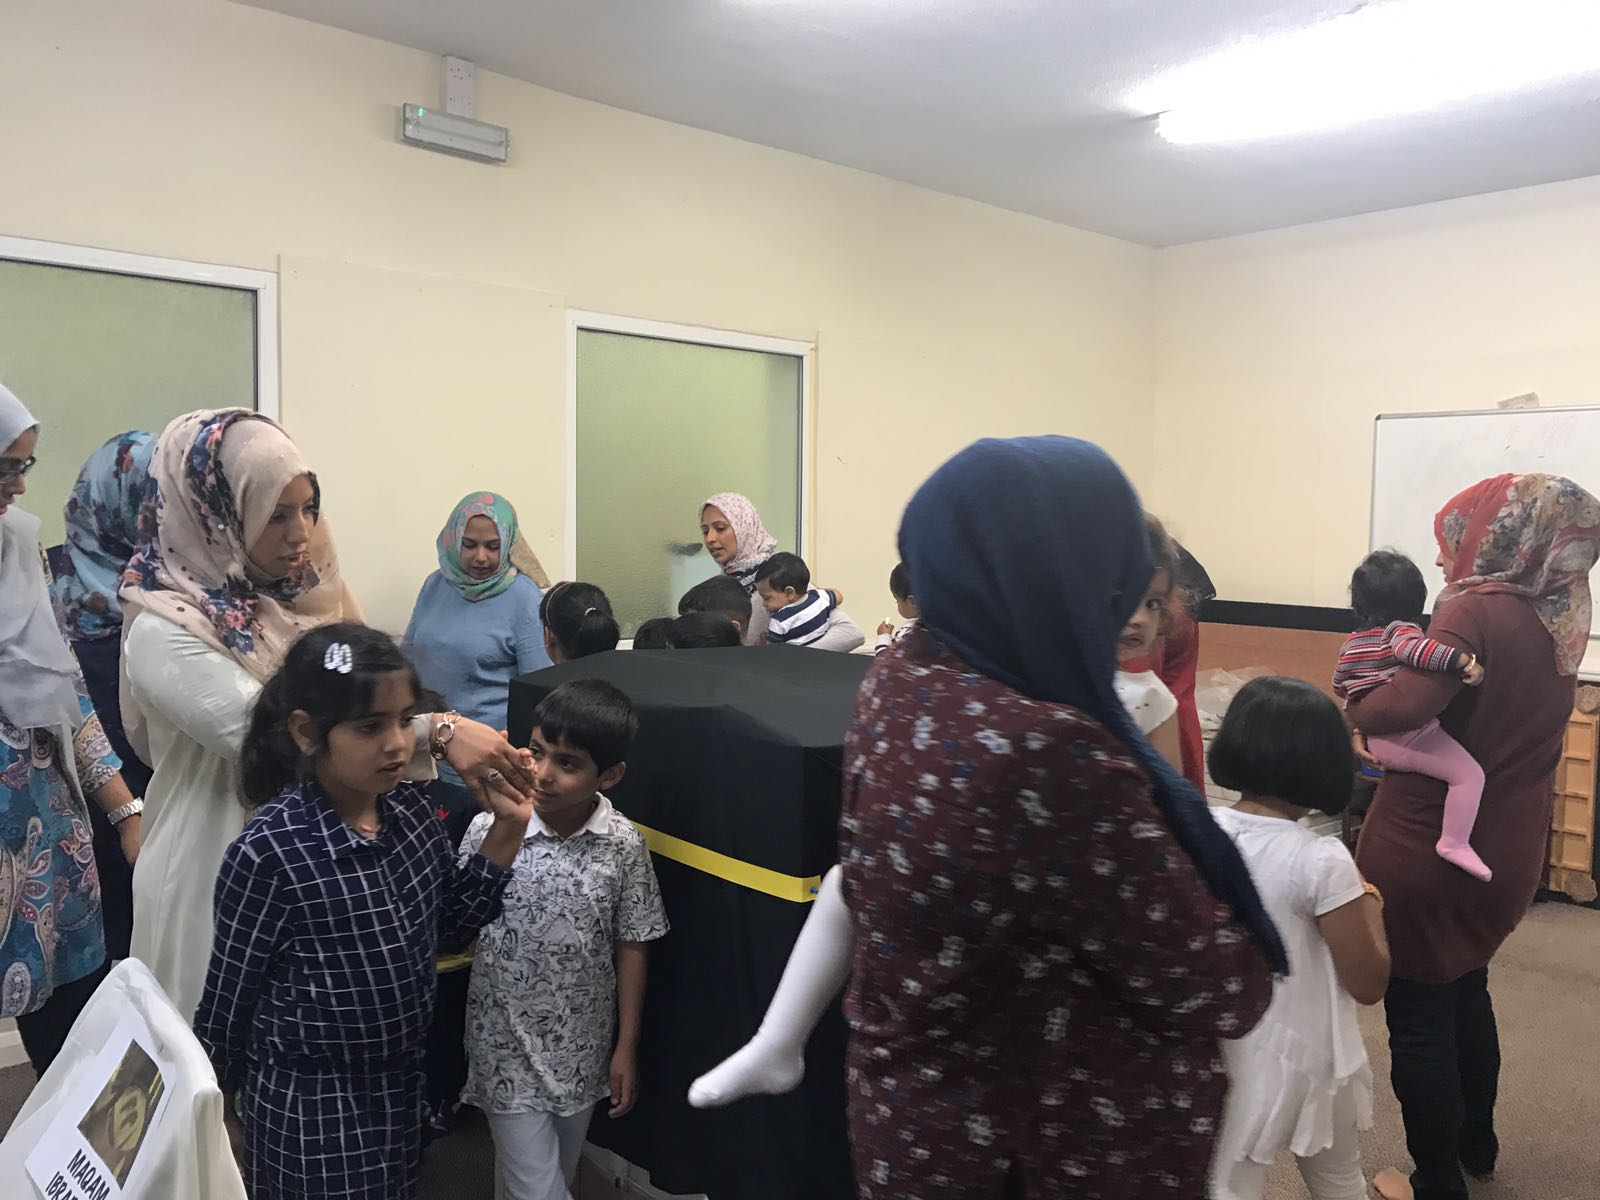 Hajj Idea 12: Hold a Hajj Simulation Workshop